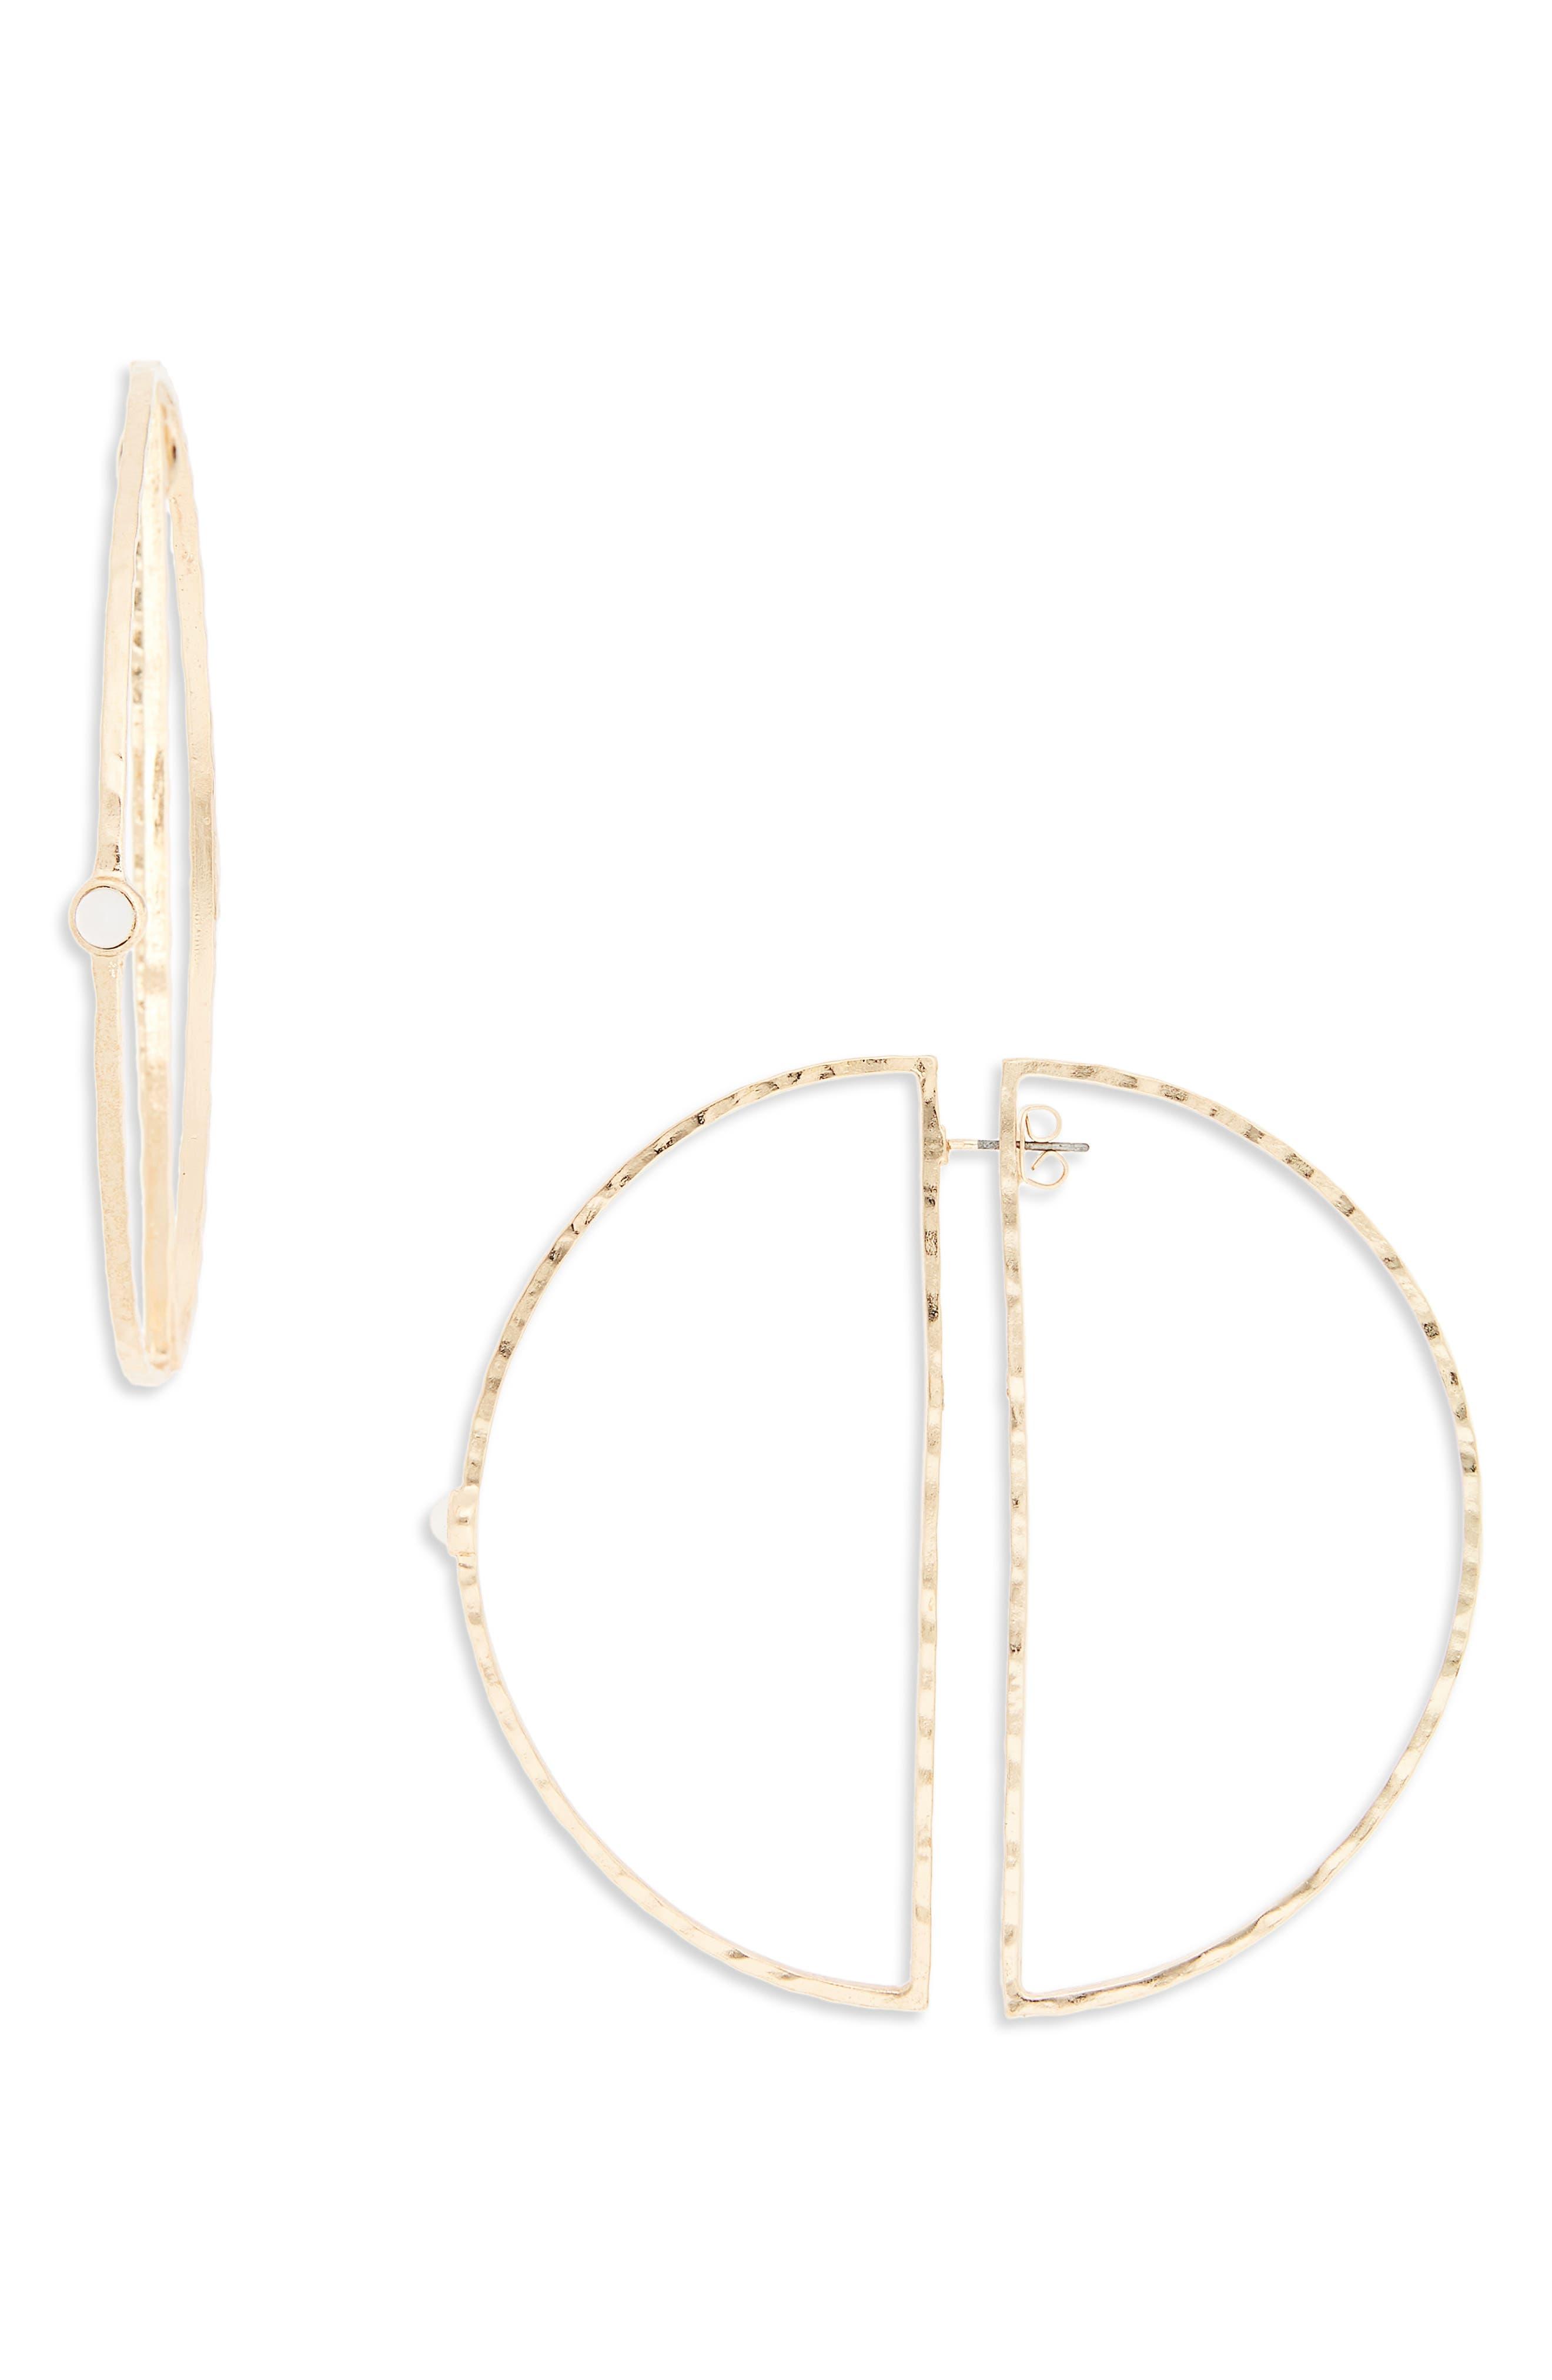 Imitation Pearl Hoop Ear Jackets,                             Main thumbnail 1, color,                             Gold/ White